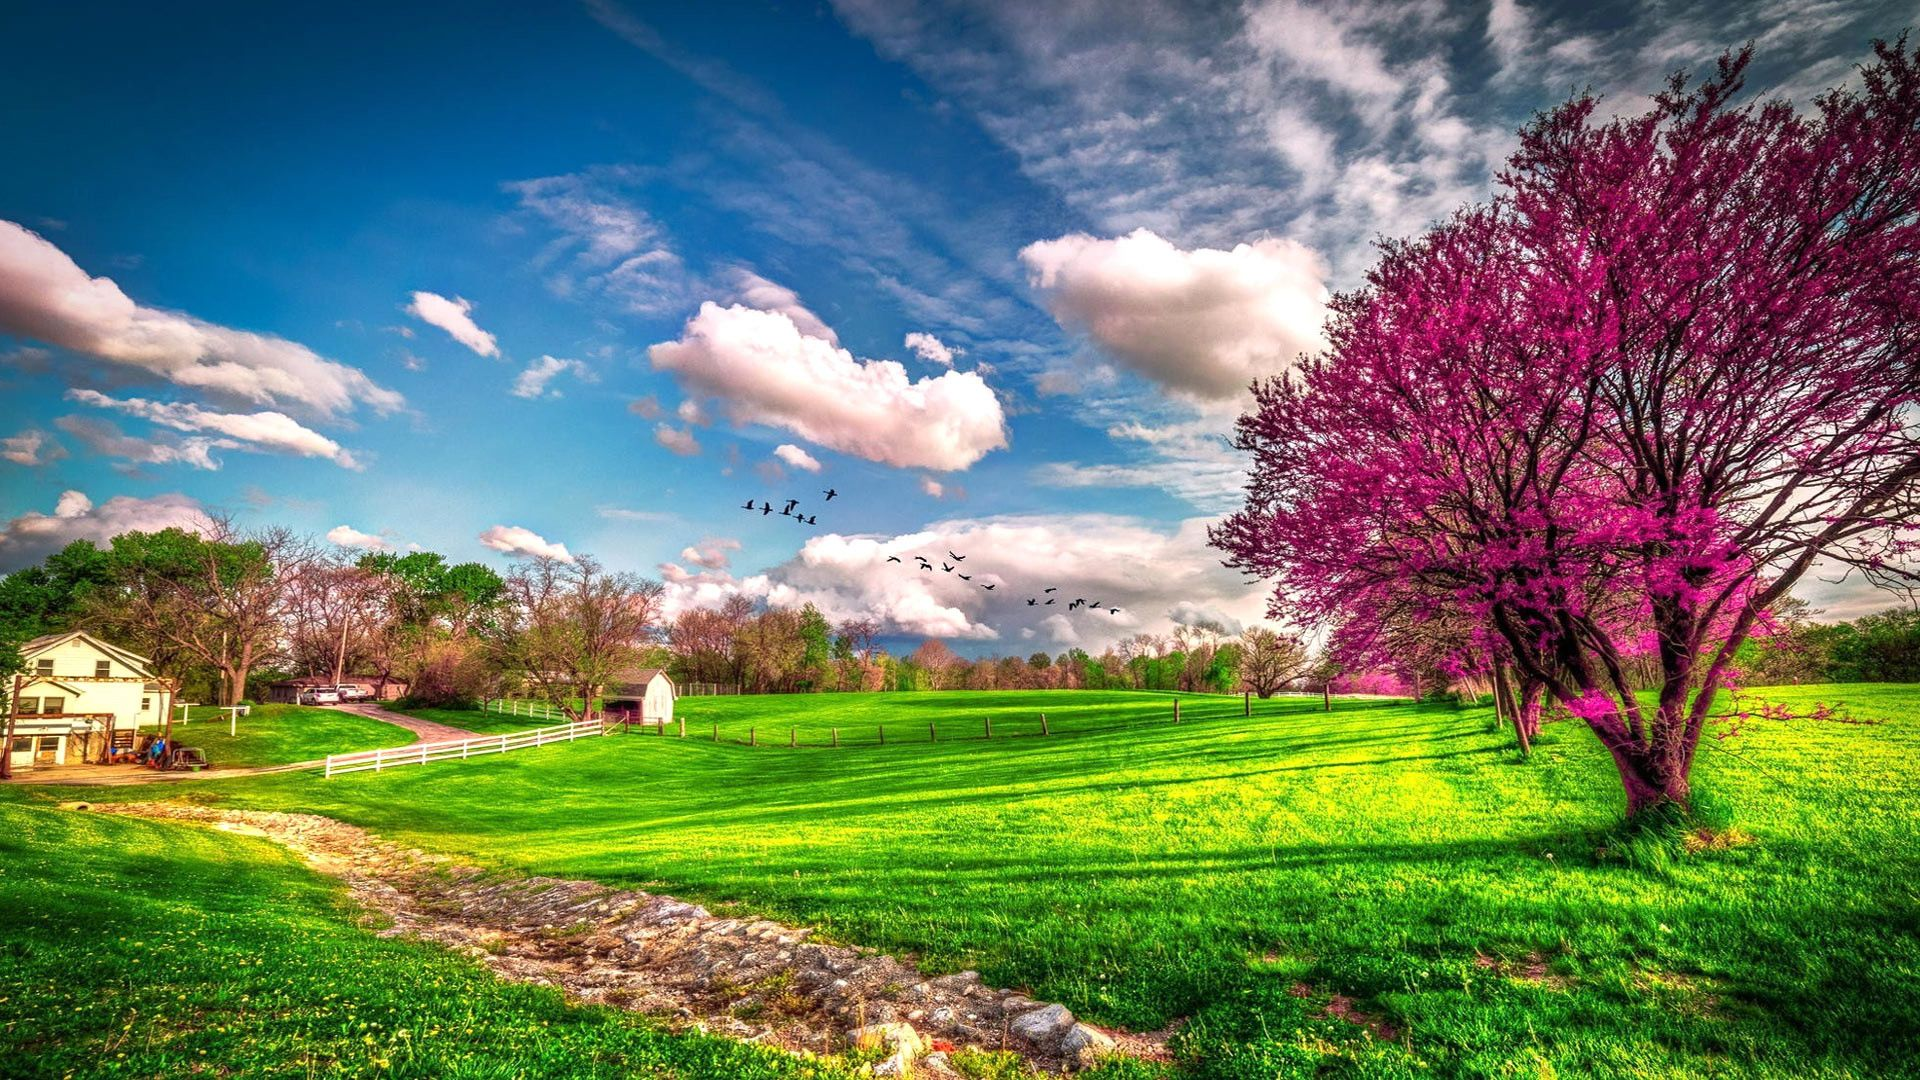 Wallpaper Download 1920x1080 Landscape beautiful spring nature -. Spring Wallpapers. Seasons ...